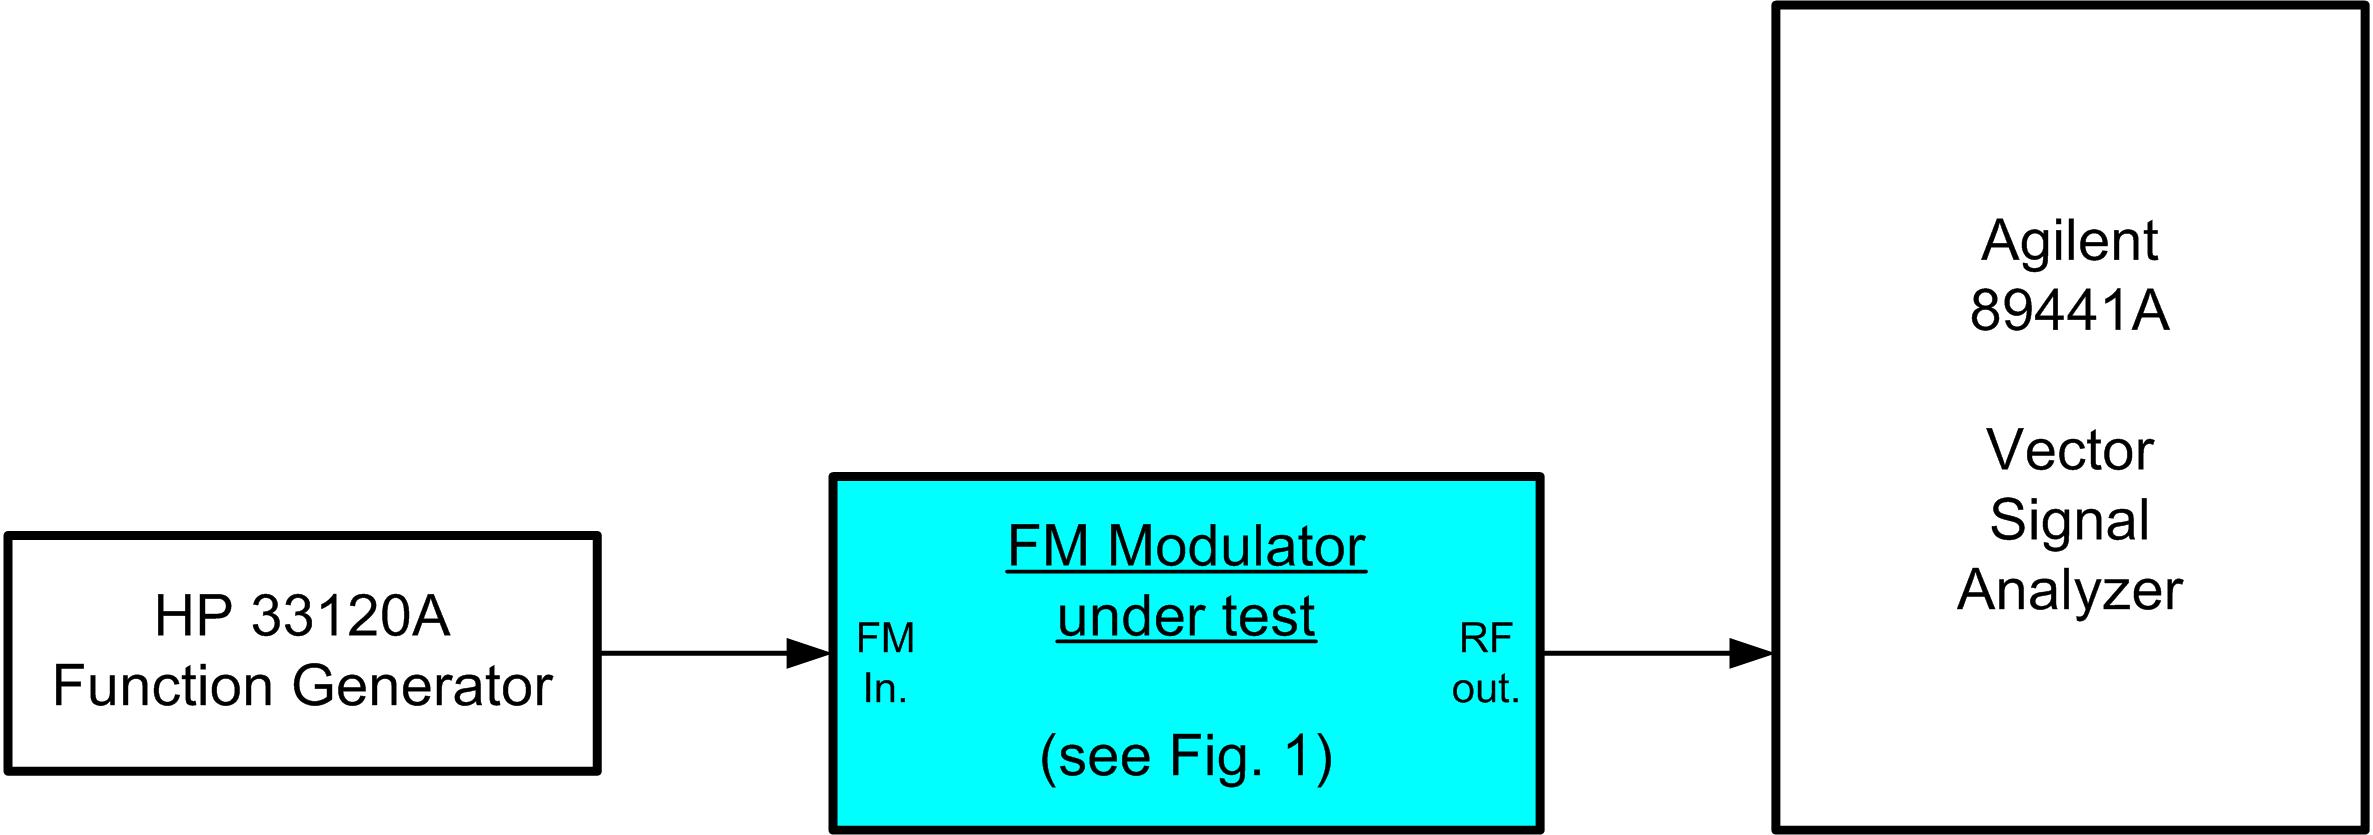 medium resolution of test setup for the fm modulator